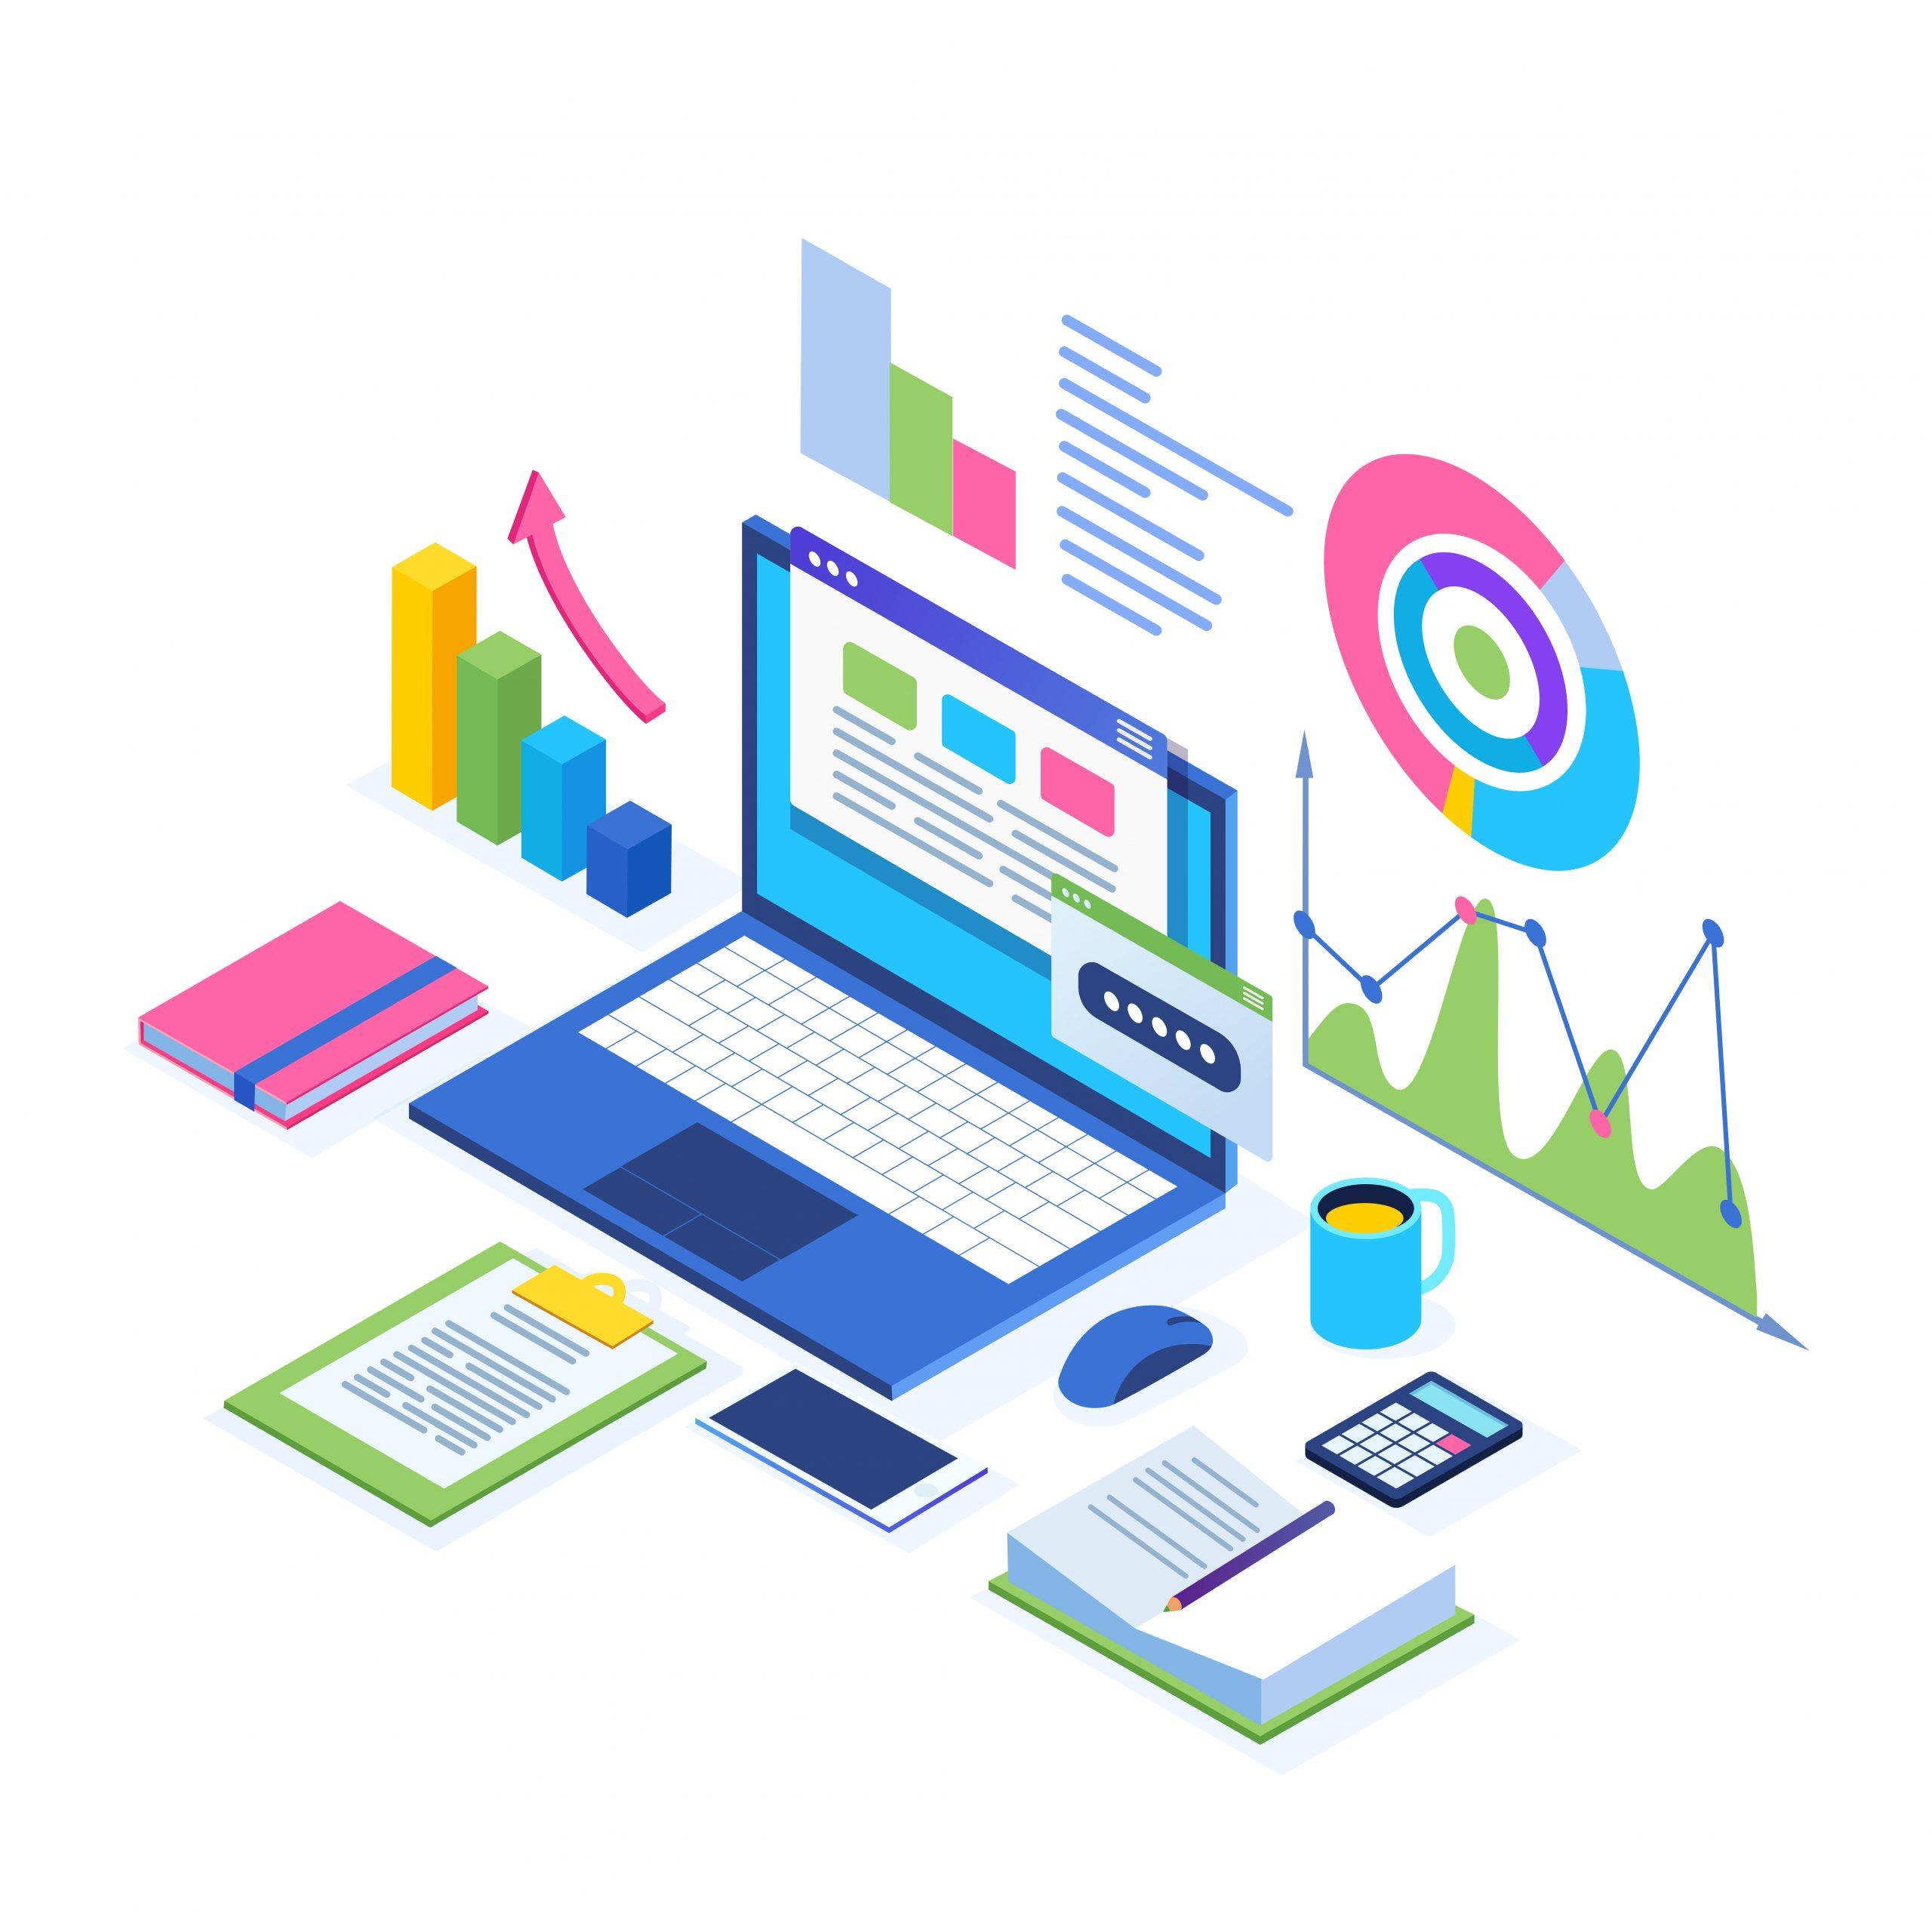 Data analysis. Digital financial reporting, seo, marketing. Busi